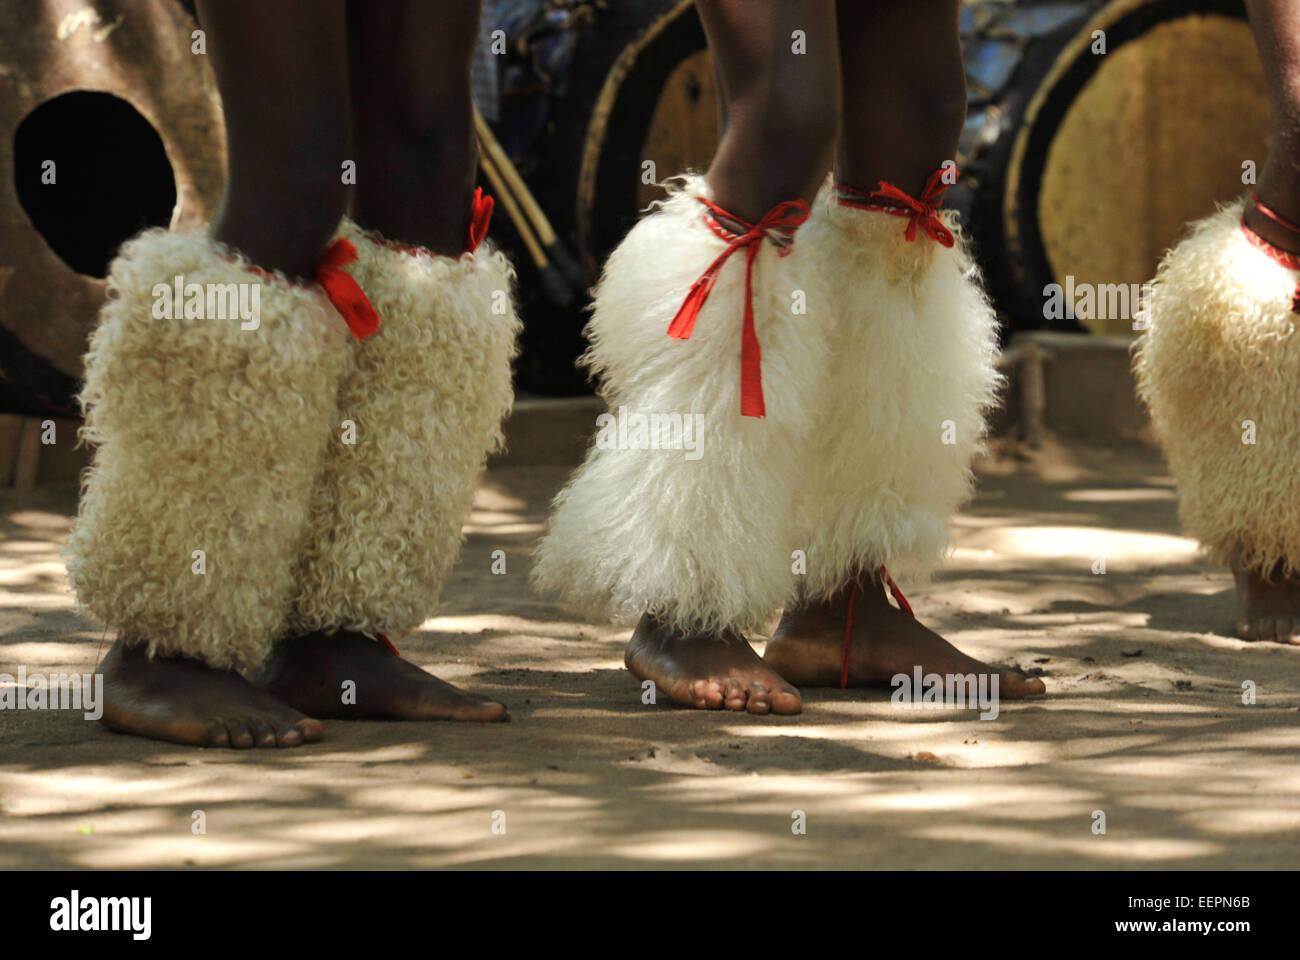 Matsamo, Swaziland, people, feet and legs, Swazi male dancers, traditional ceremonial warrior dress, entertainment, - Stock Image